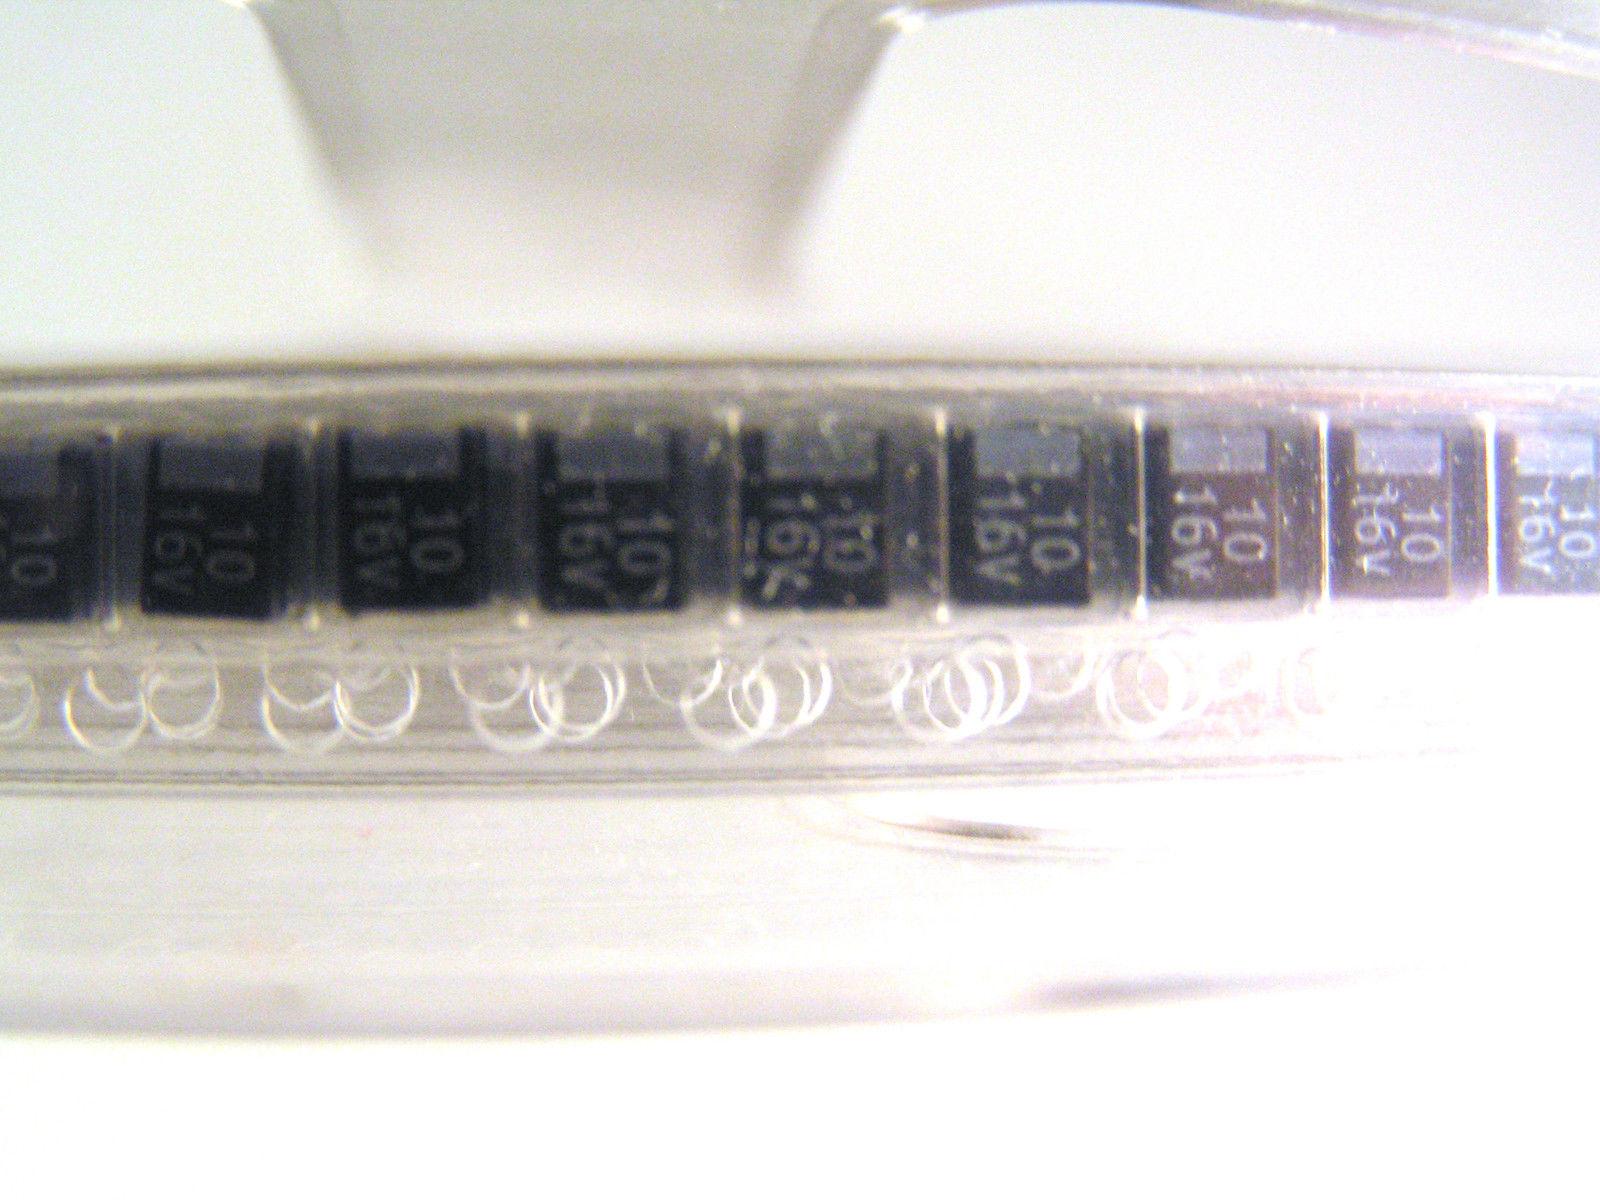 Samsung TCSVS1C106KBAR Tantalum Capacitor 10uF 20/% 16V 25 pieces OL0192